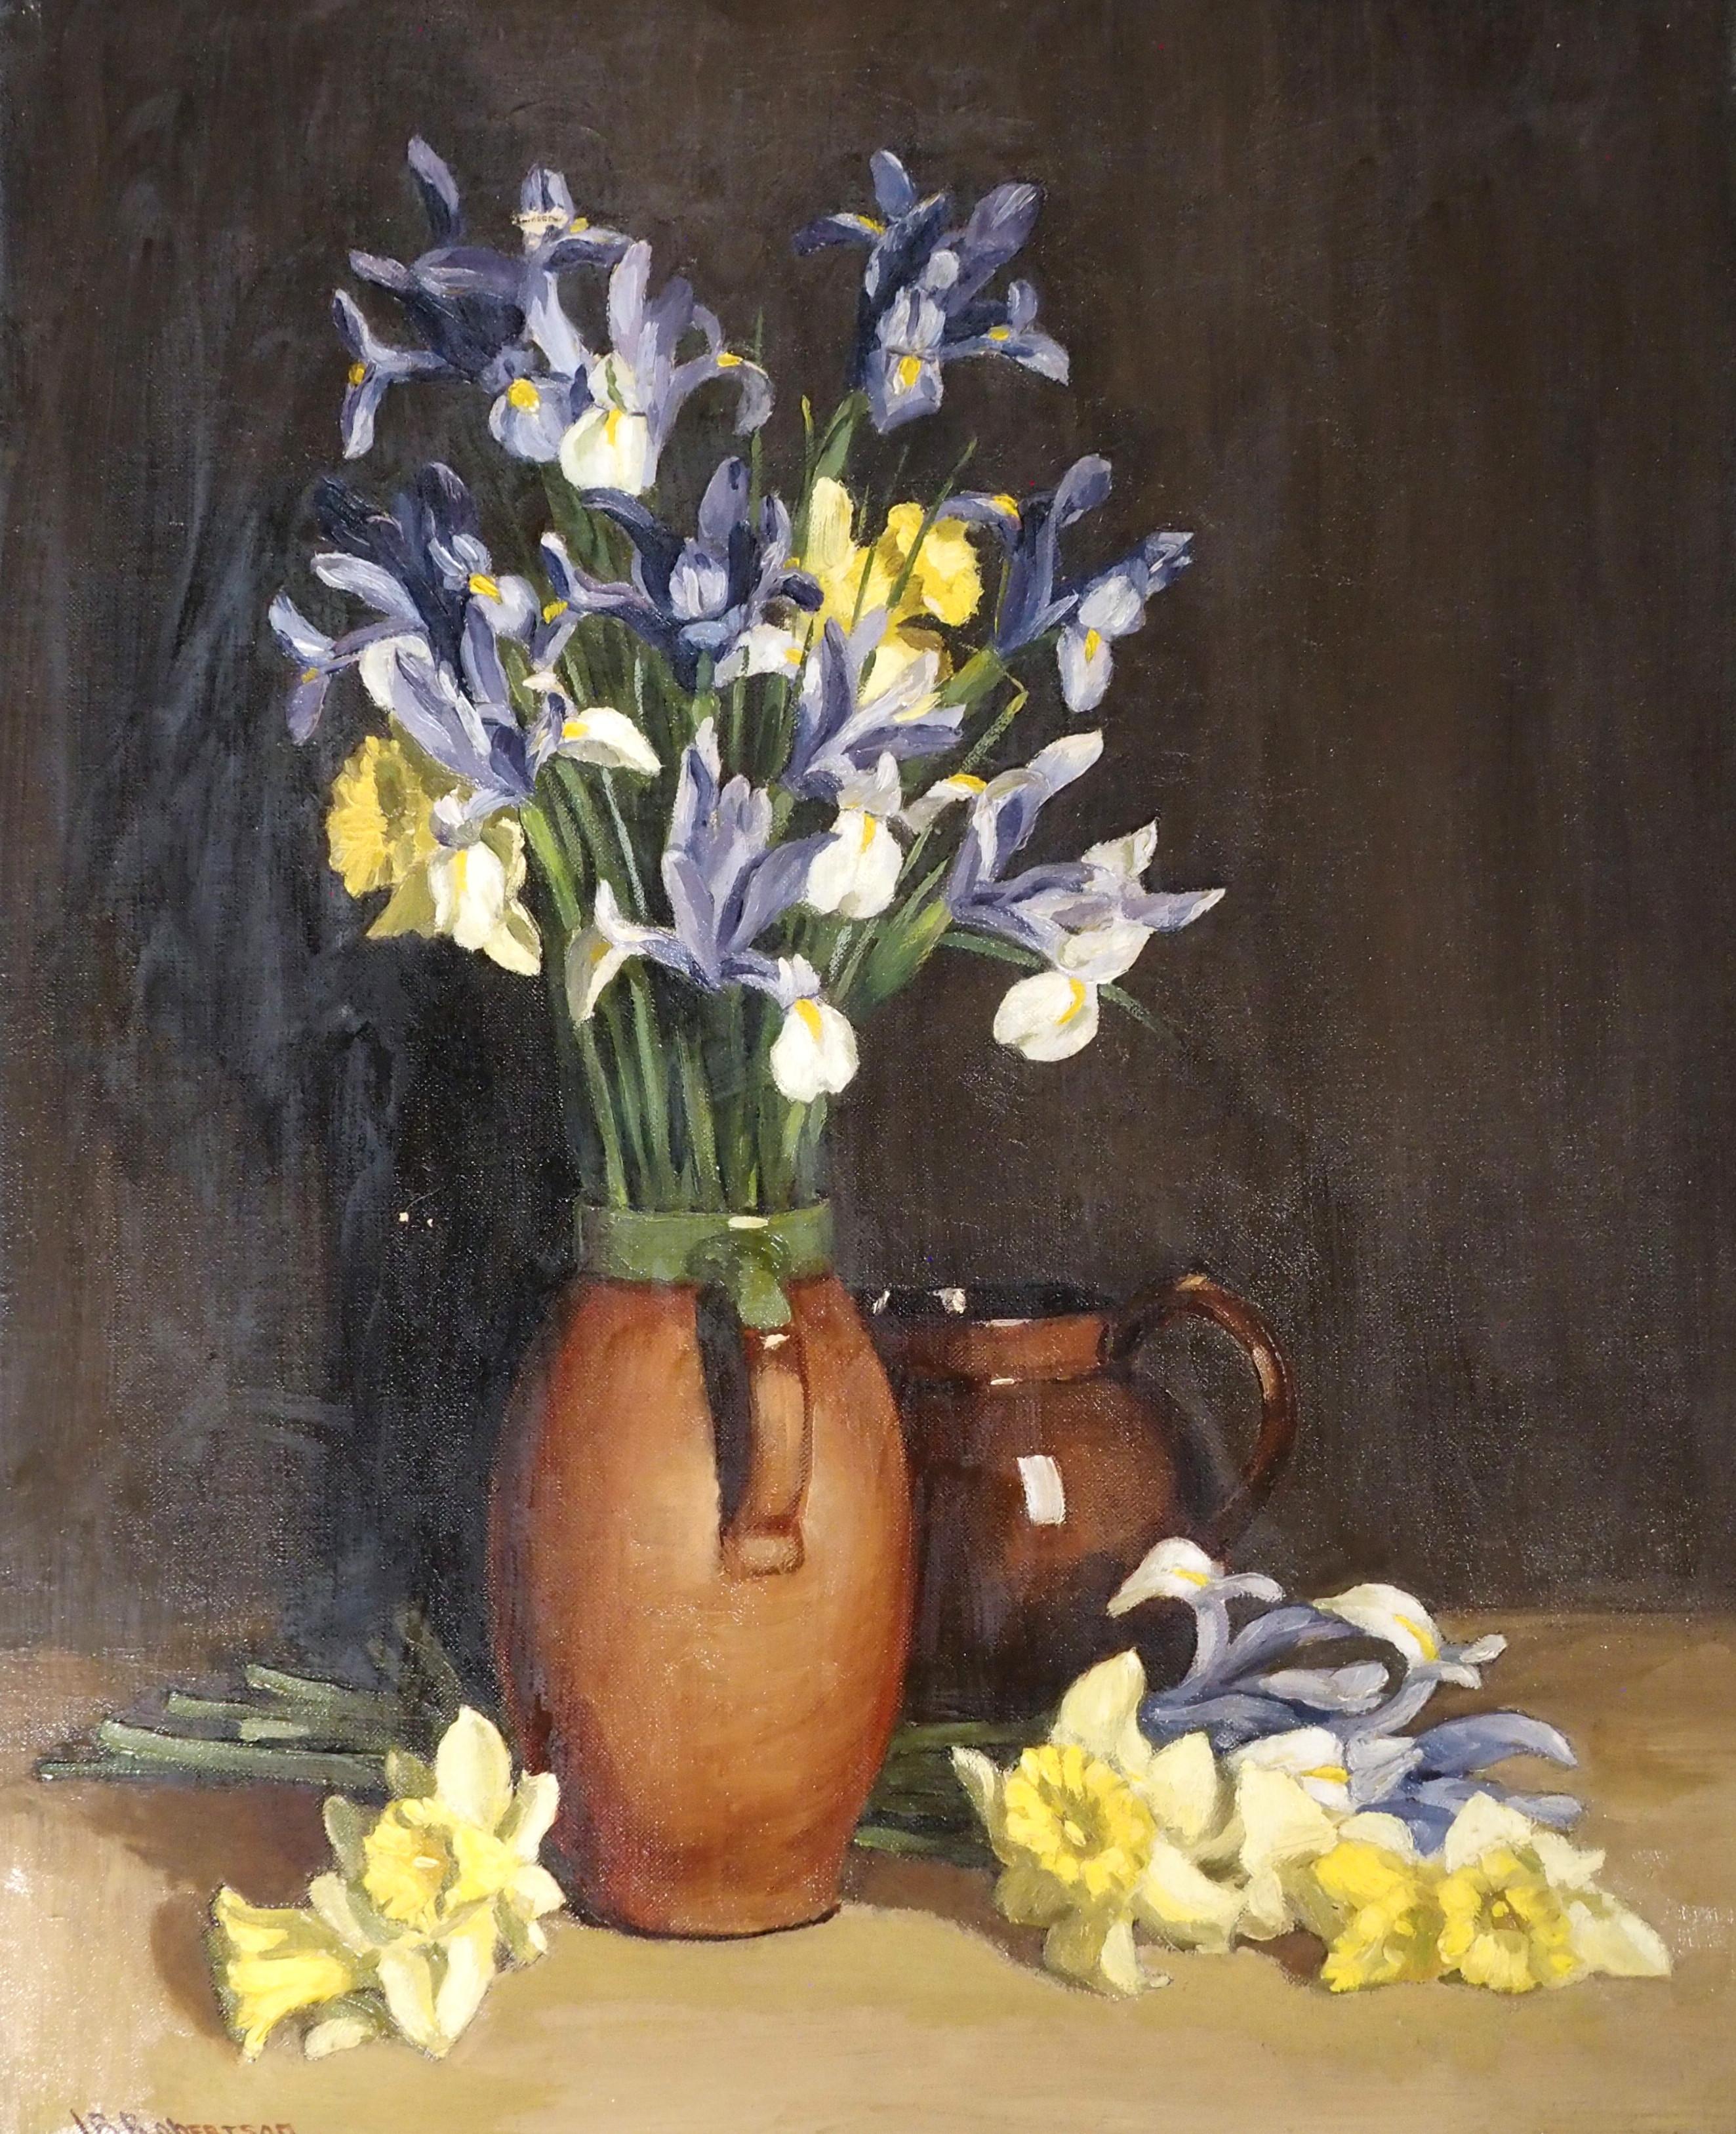 JOHN BURNS ROBERTSON (SCOTTISH FL. 1920-1944) STILL LIFE WITH IRISES AND DAFFODILS Oil on canvas,